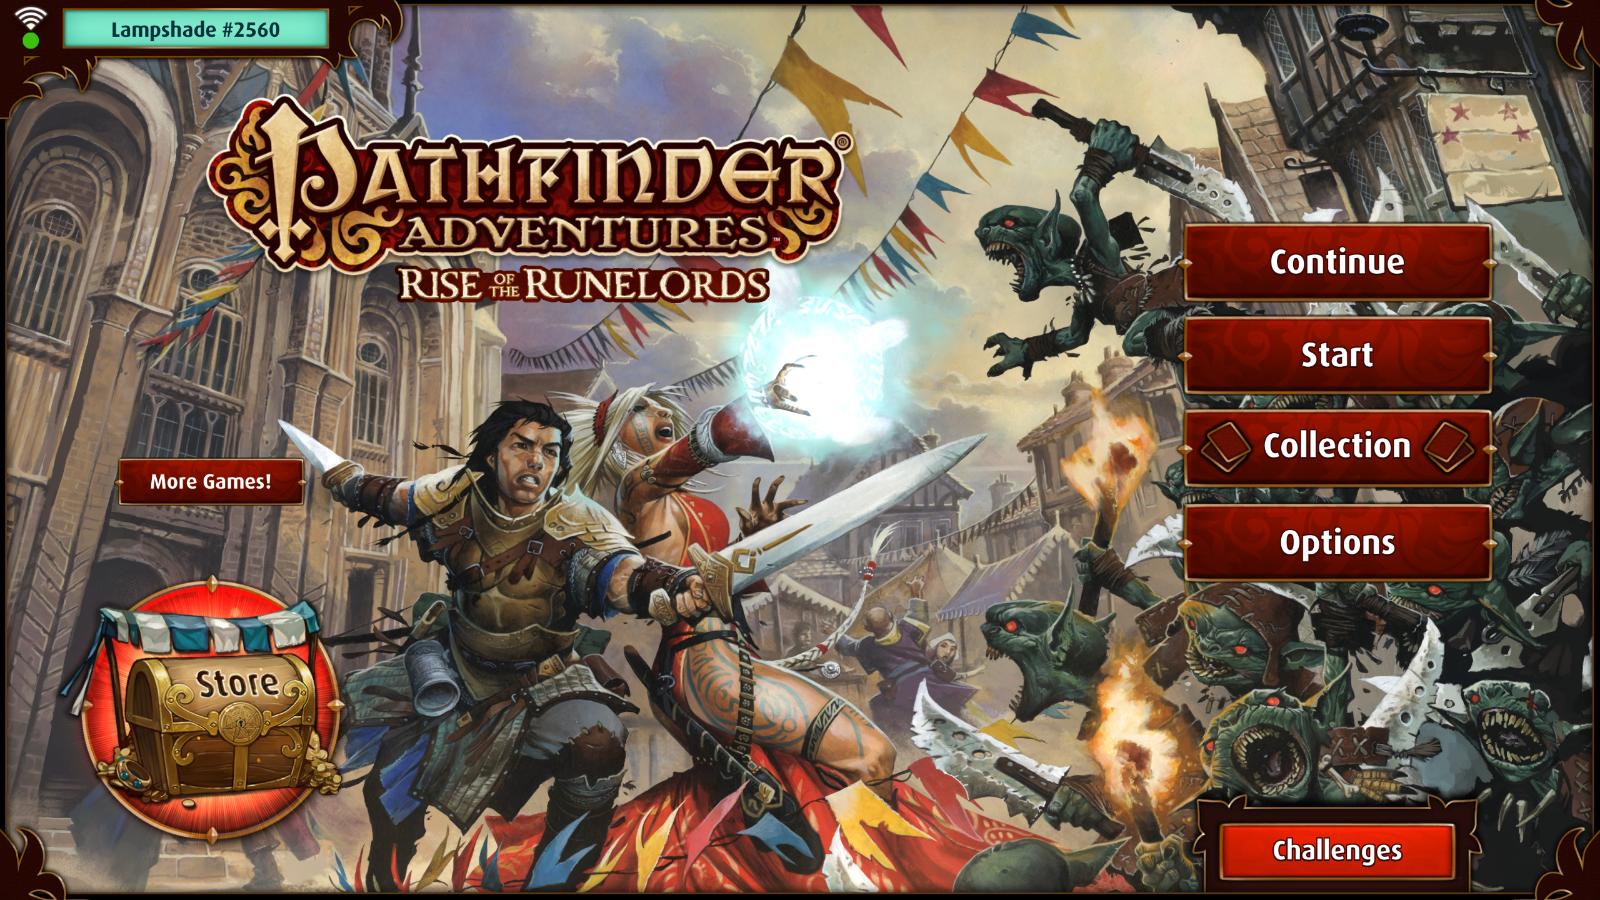 Pathfinder - menu